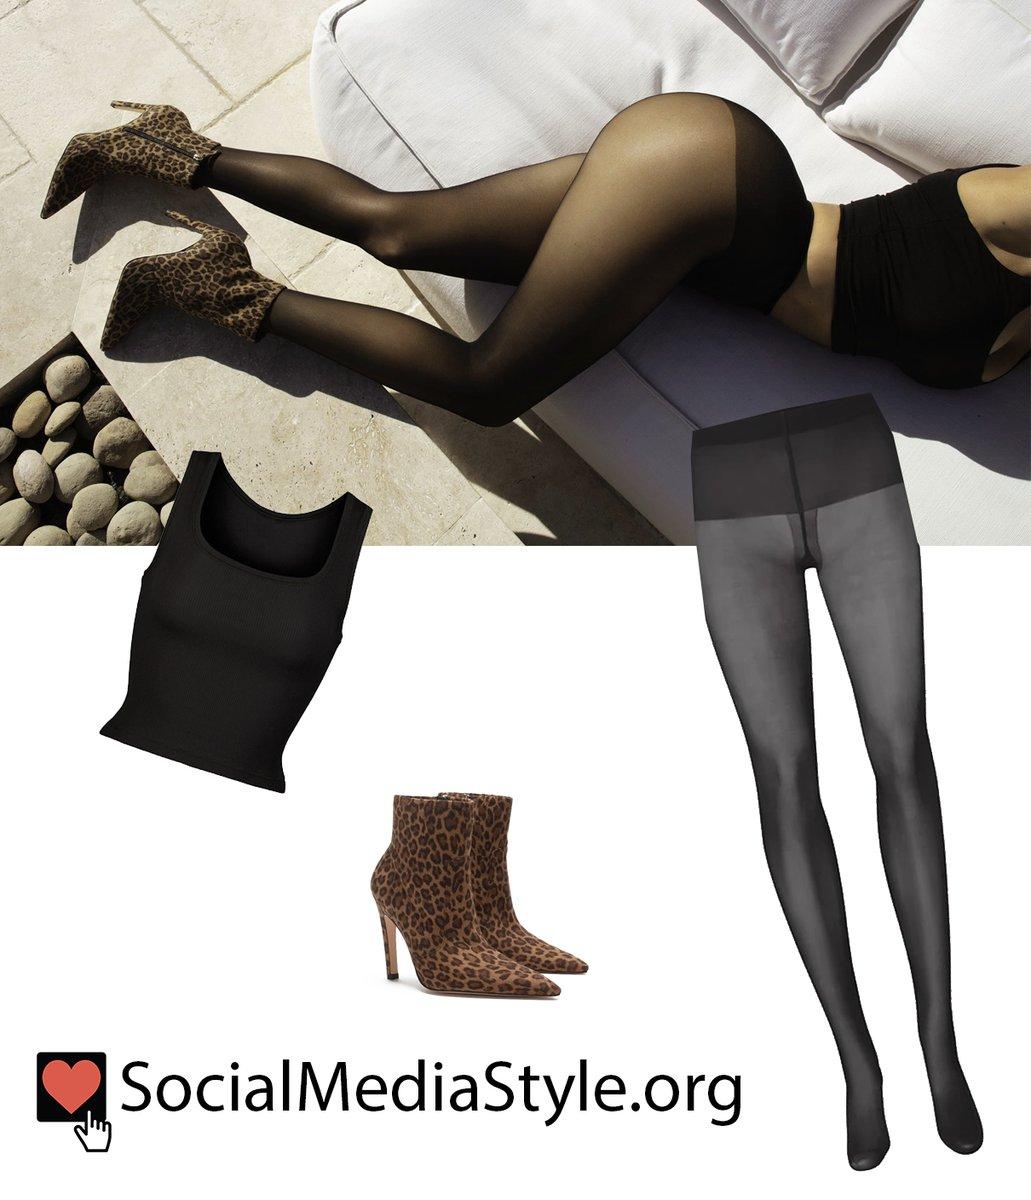 Buy @khloekardashian's @Skims black tank top and tights and @GoodAmerican leopard print boots here:  #KhloeKardashian #kuwtk #Skims #tanktop #croptop #tights #GoodAmerican #leopardprintboots #leopardprint #leopardboots #boots #booties #ankleboots